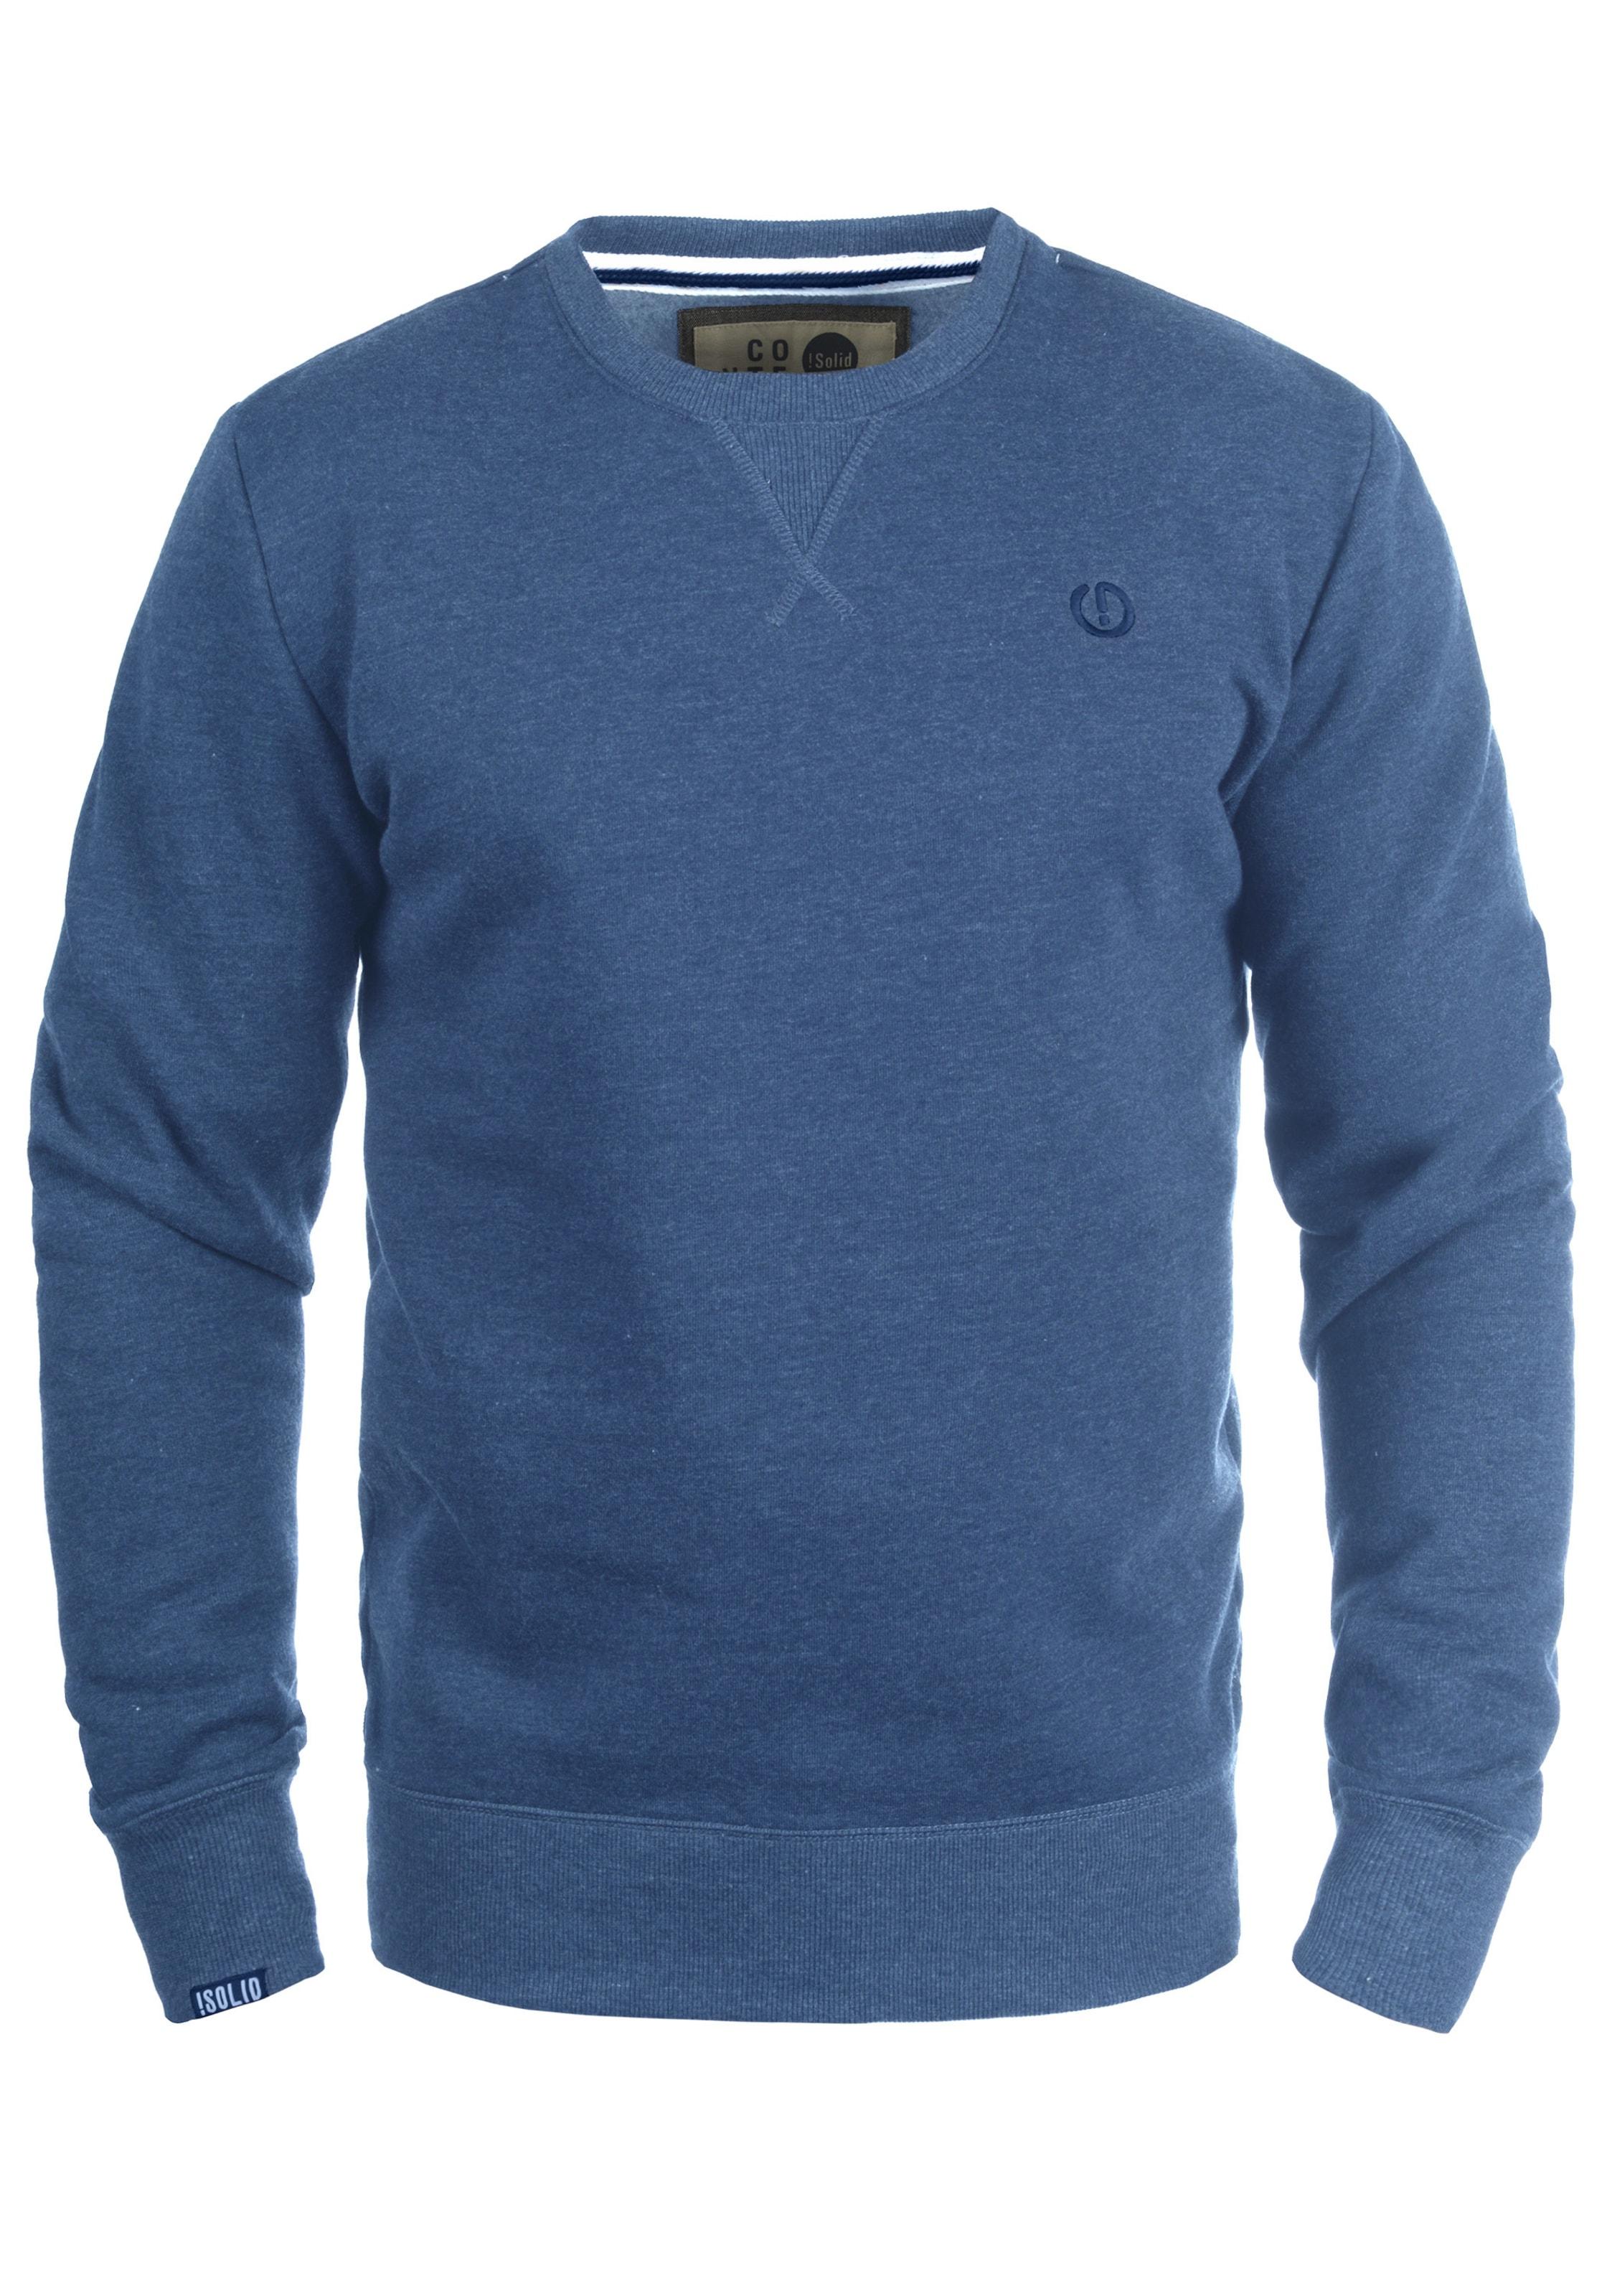 'benn In Blau Sweatshirt O neck' solid iXOlPkuTZw